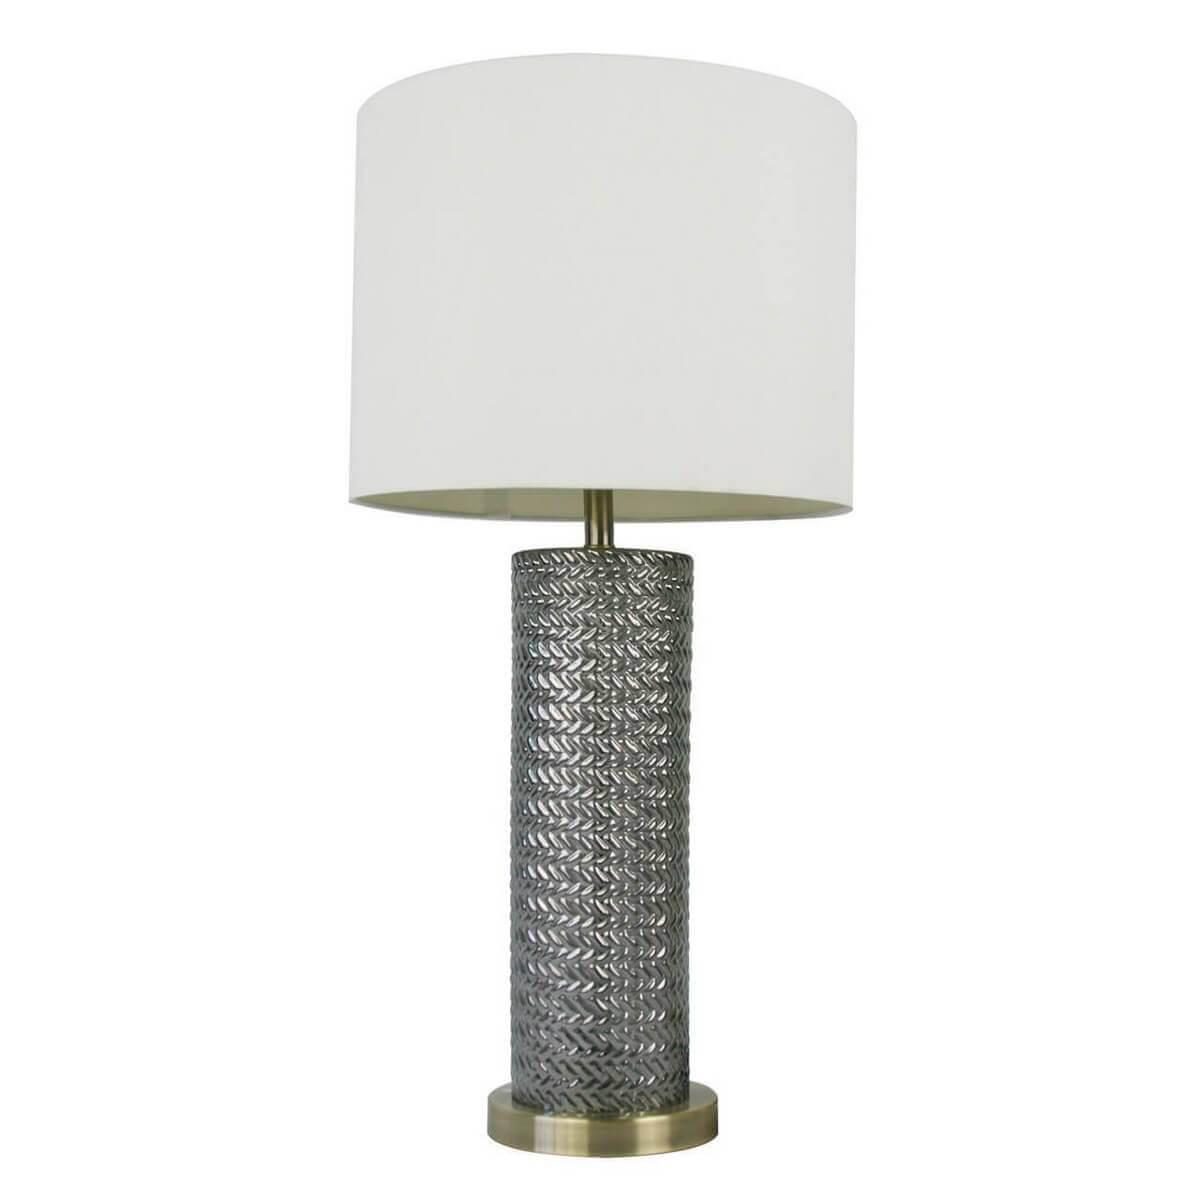 Настольная лампа MW-Light 720031001 Кьянти фото